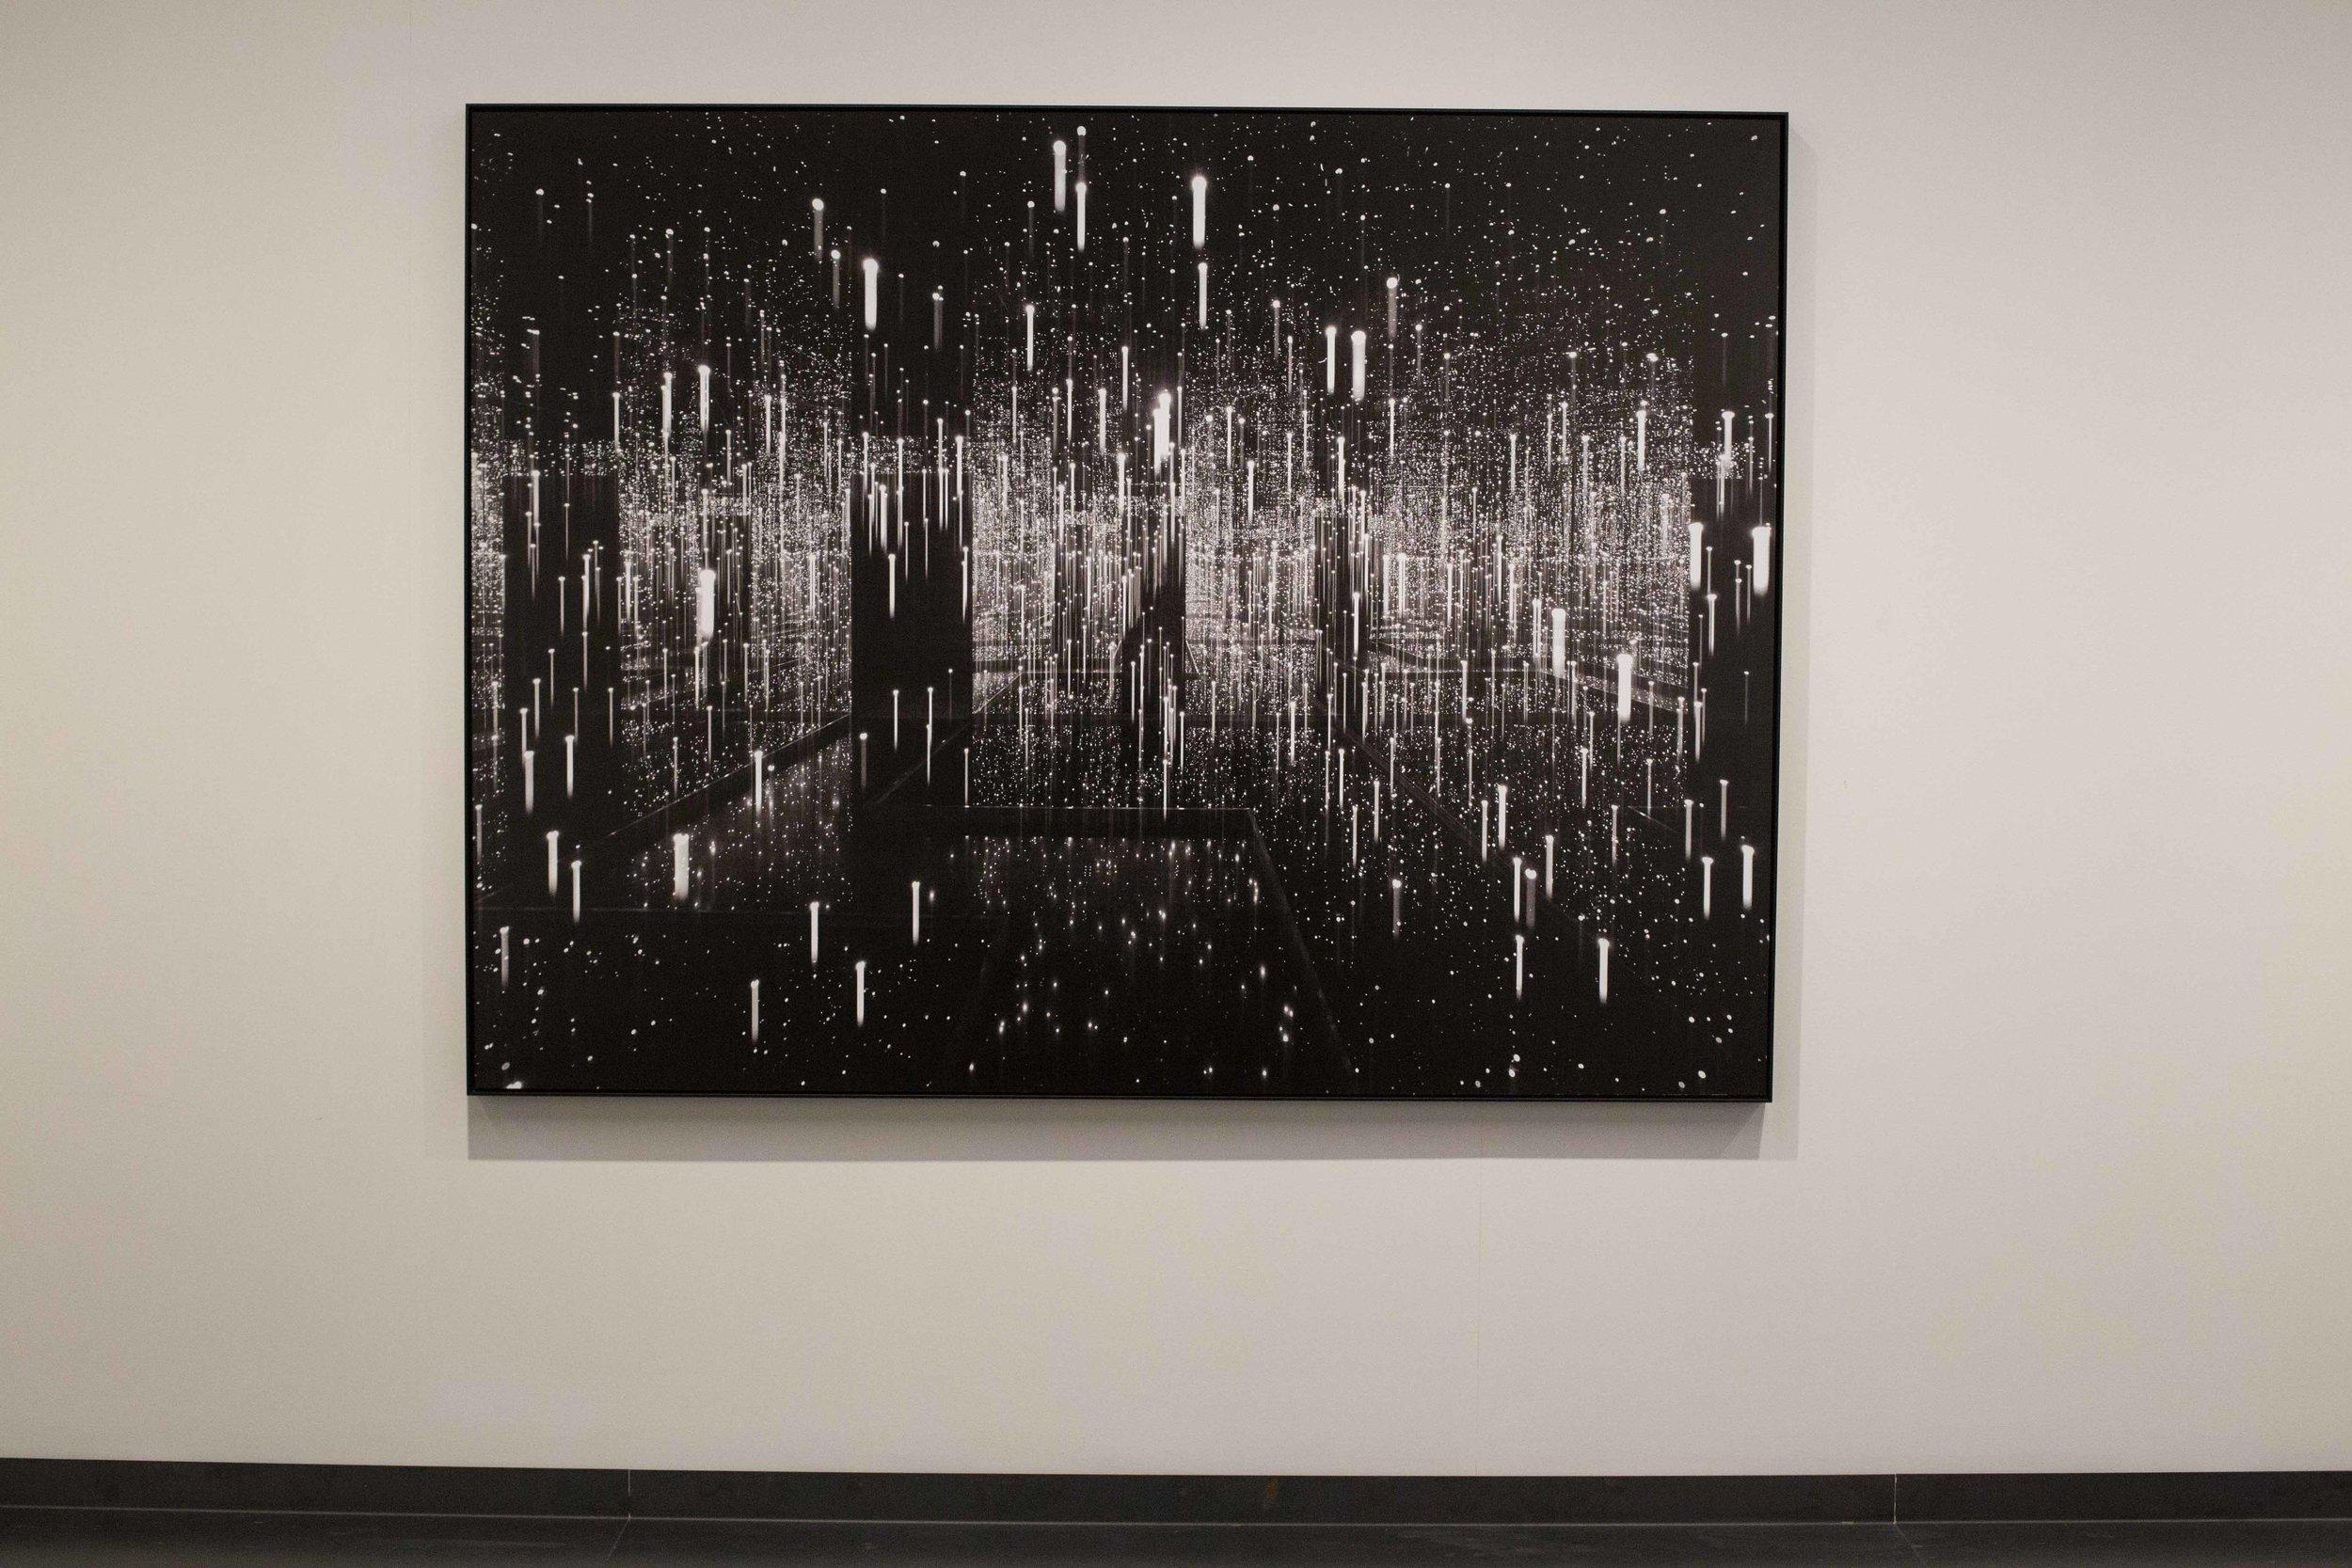 """Ciudades, Museos, Mujeres, Medusas"". Galeria Senda, Barcelona"